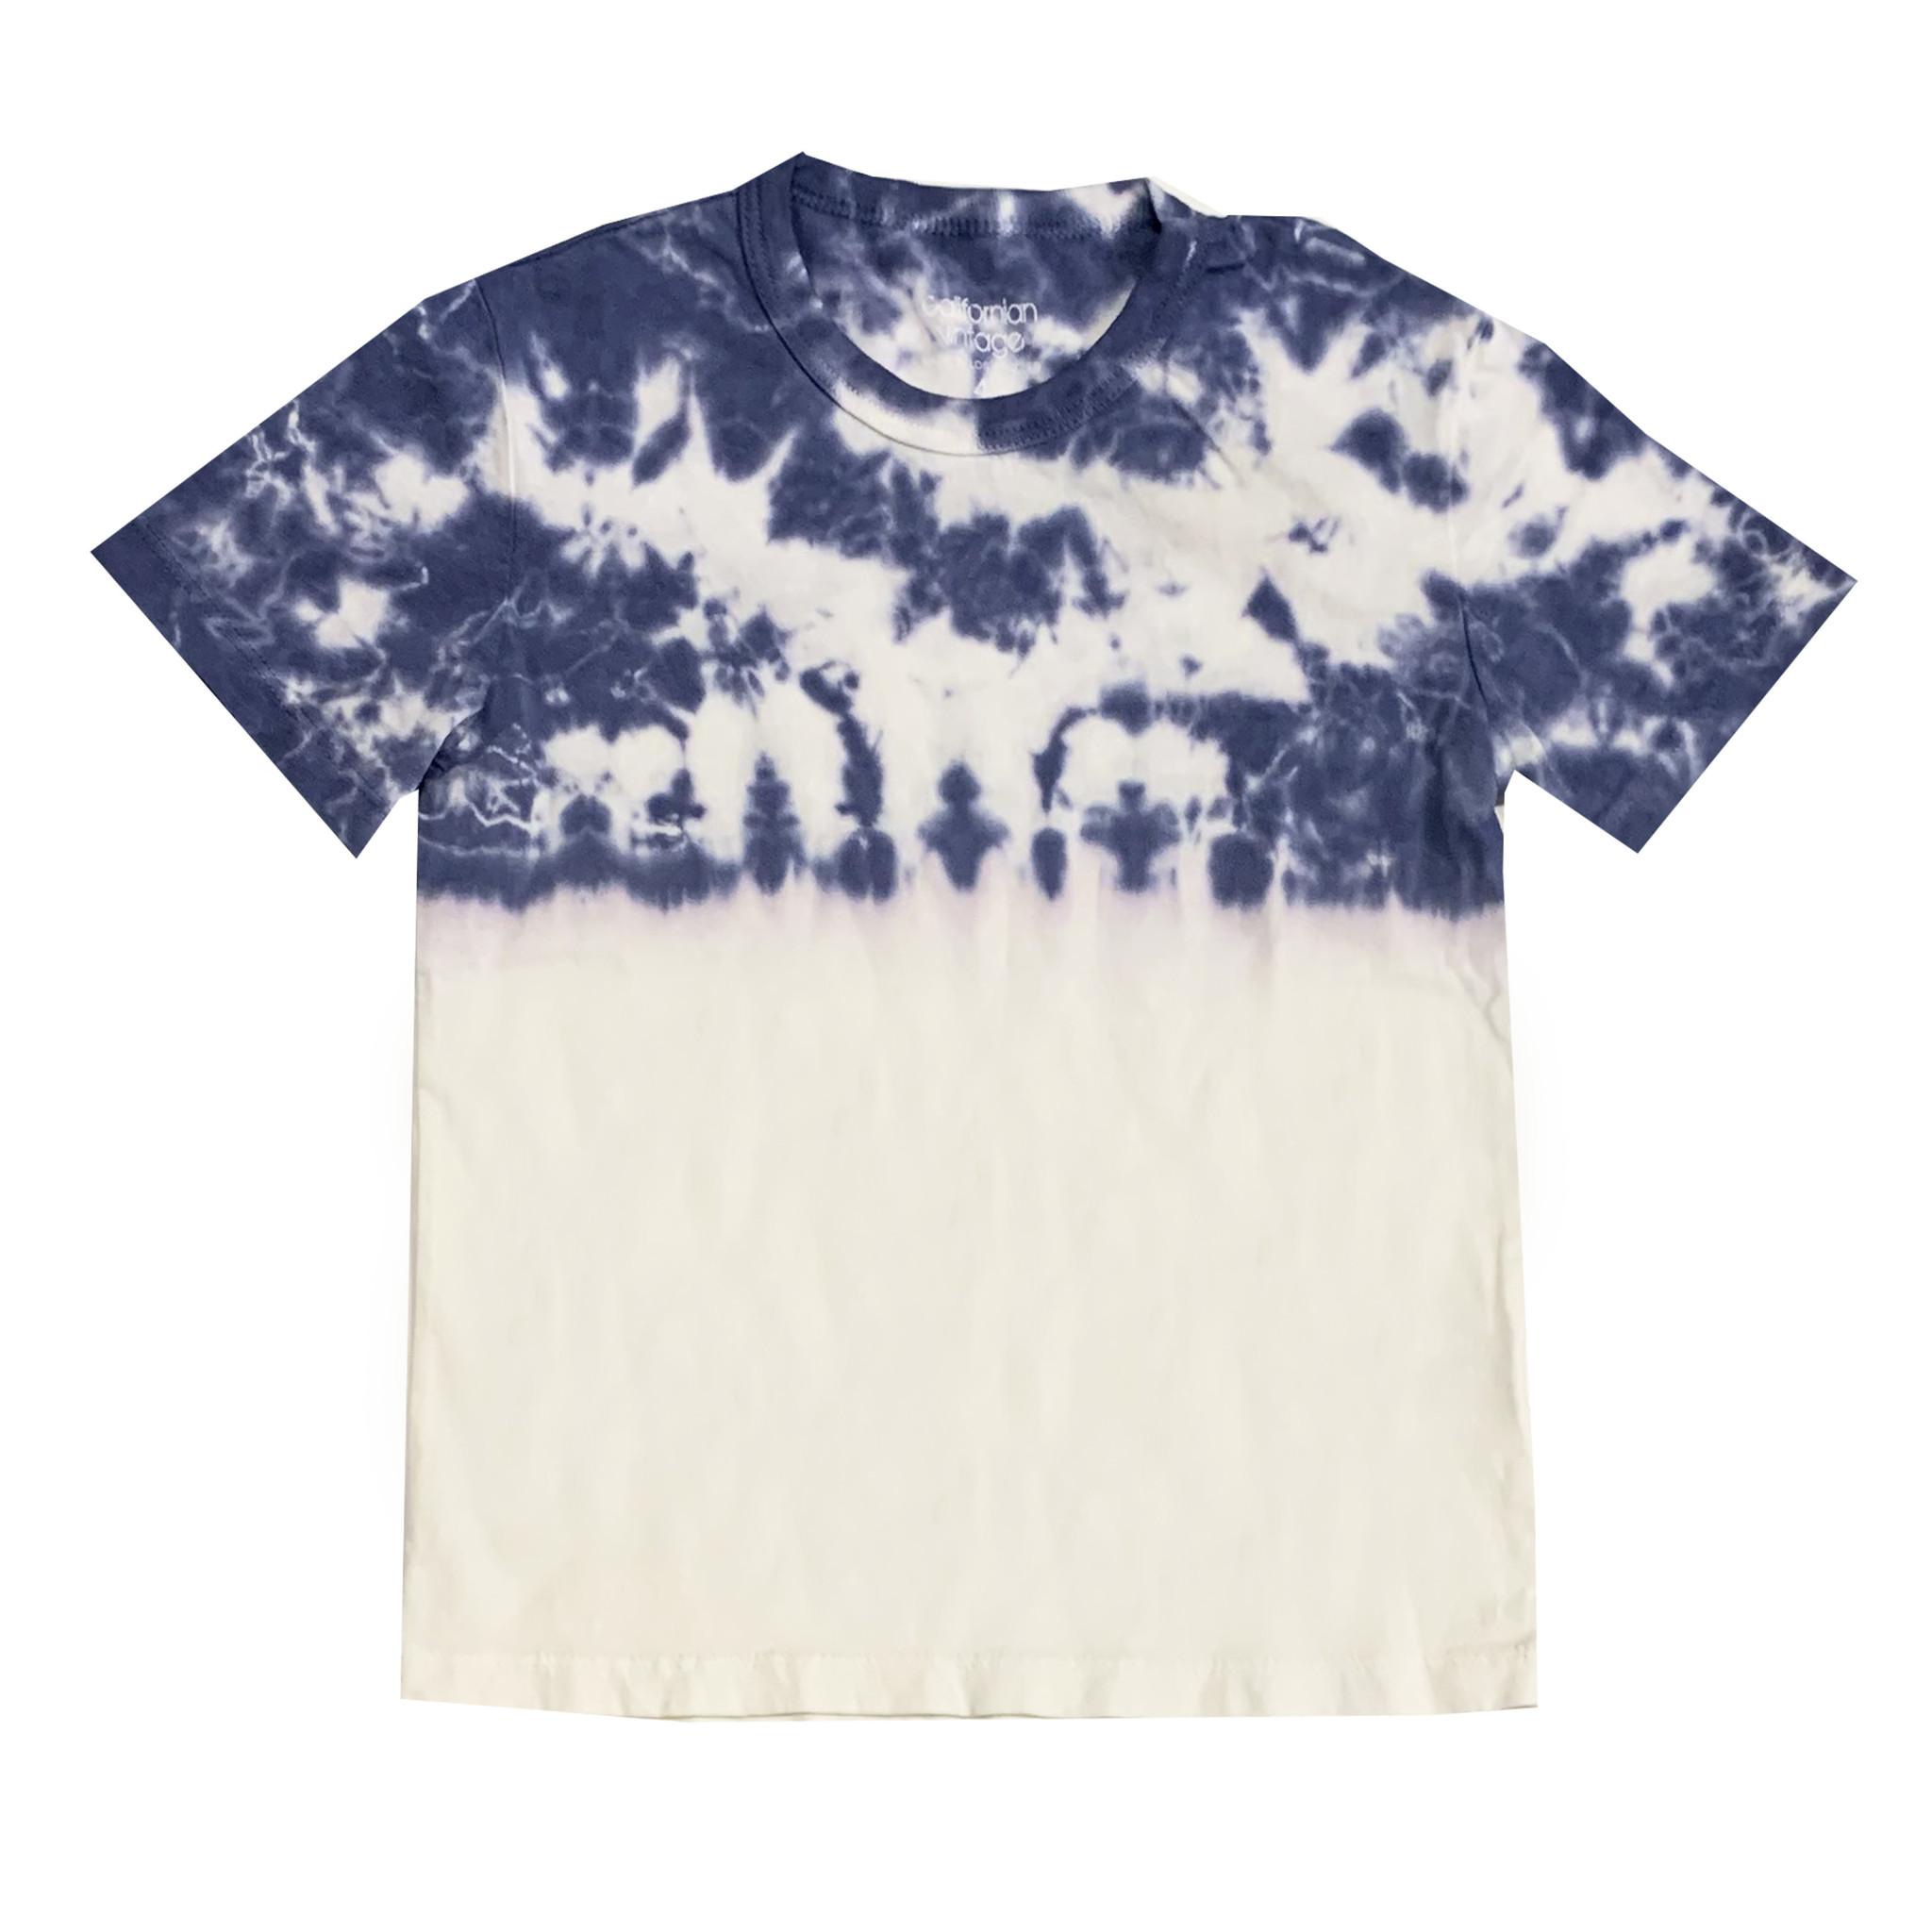 Californian Vintage Blue & White Half Tie Dye Tee